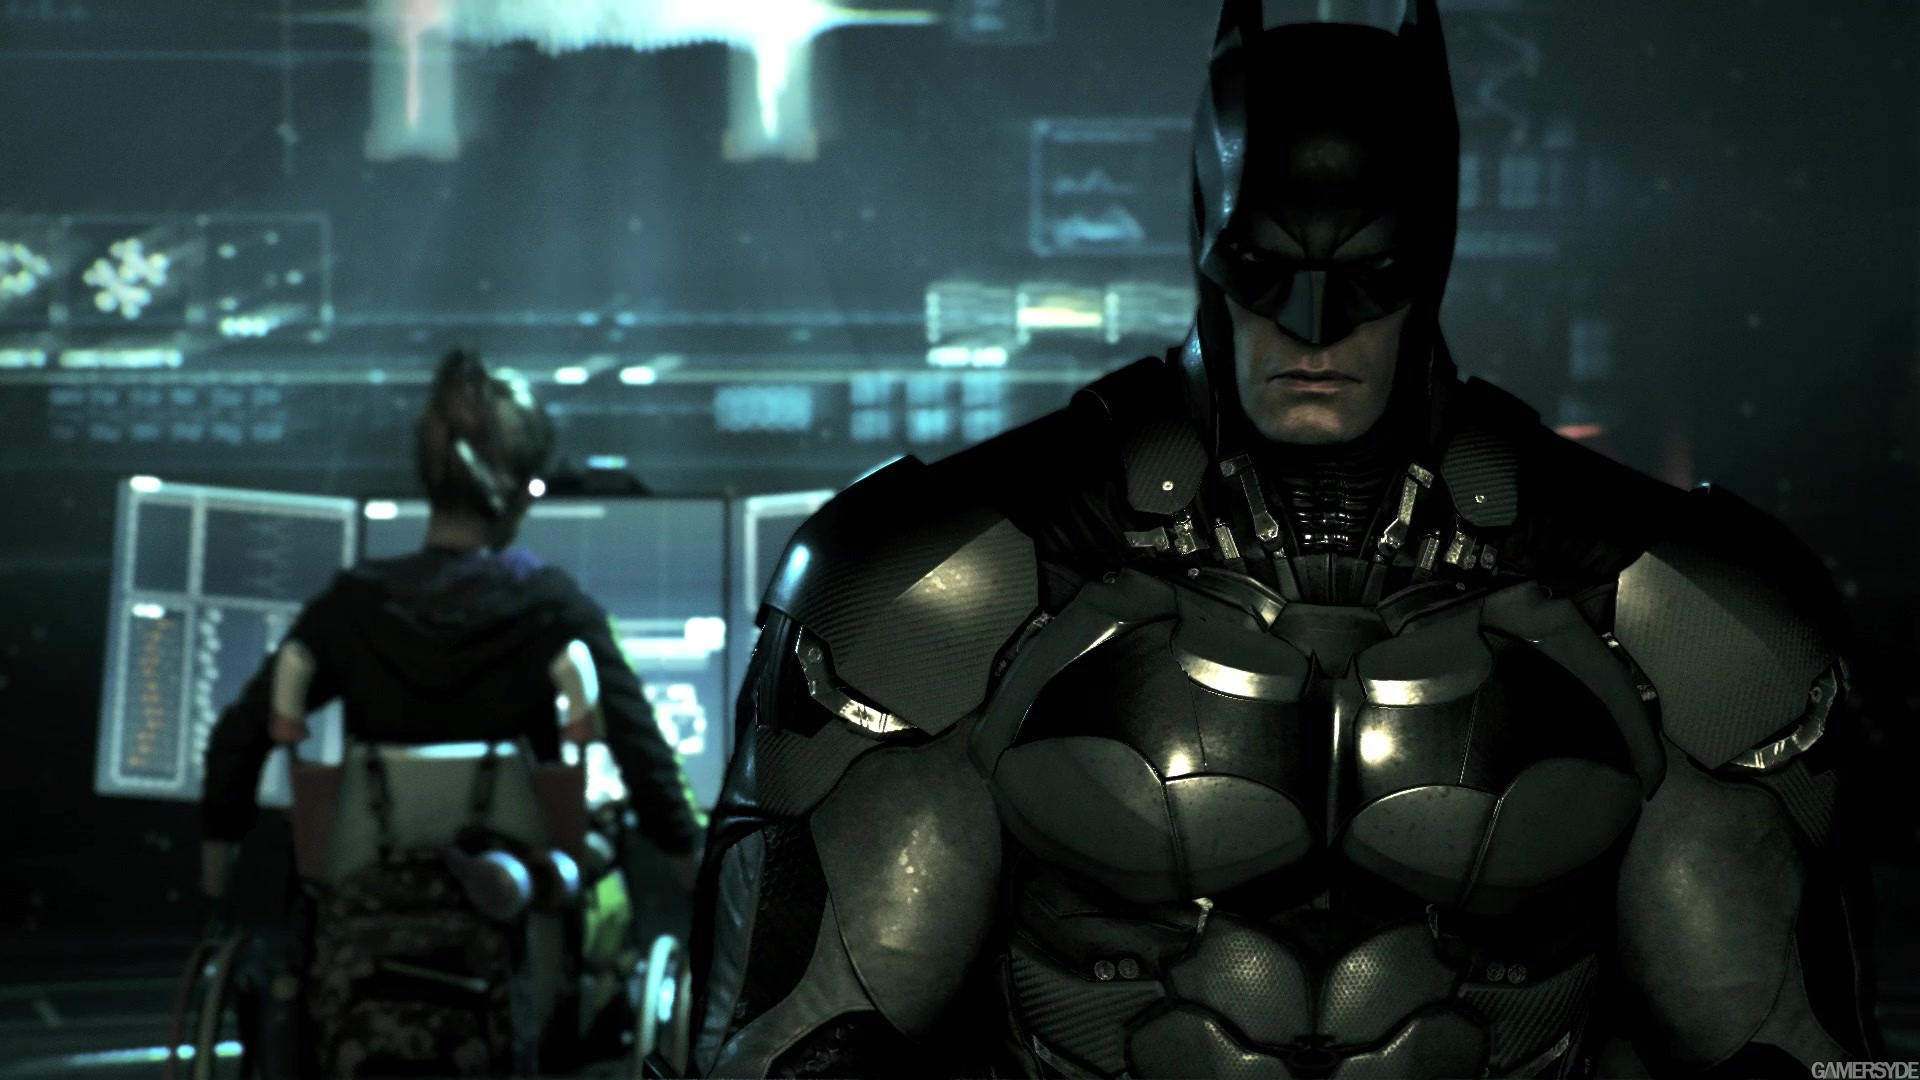 image batman arkham knight 25050 2899 0008 اولین تریلر گیم پلی Batman : Arkham Knight منتشر شد : حماسه ی نهایی